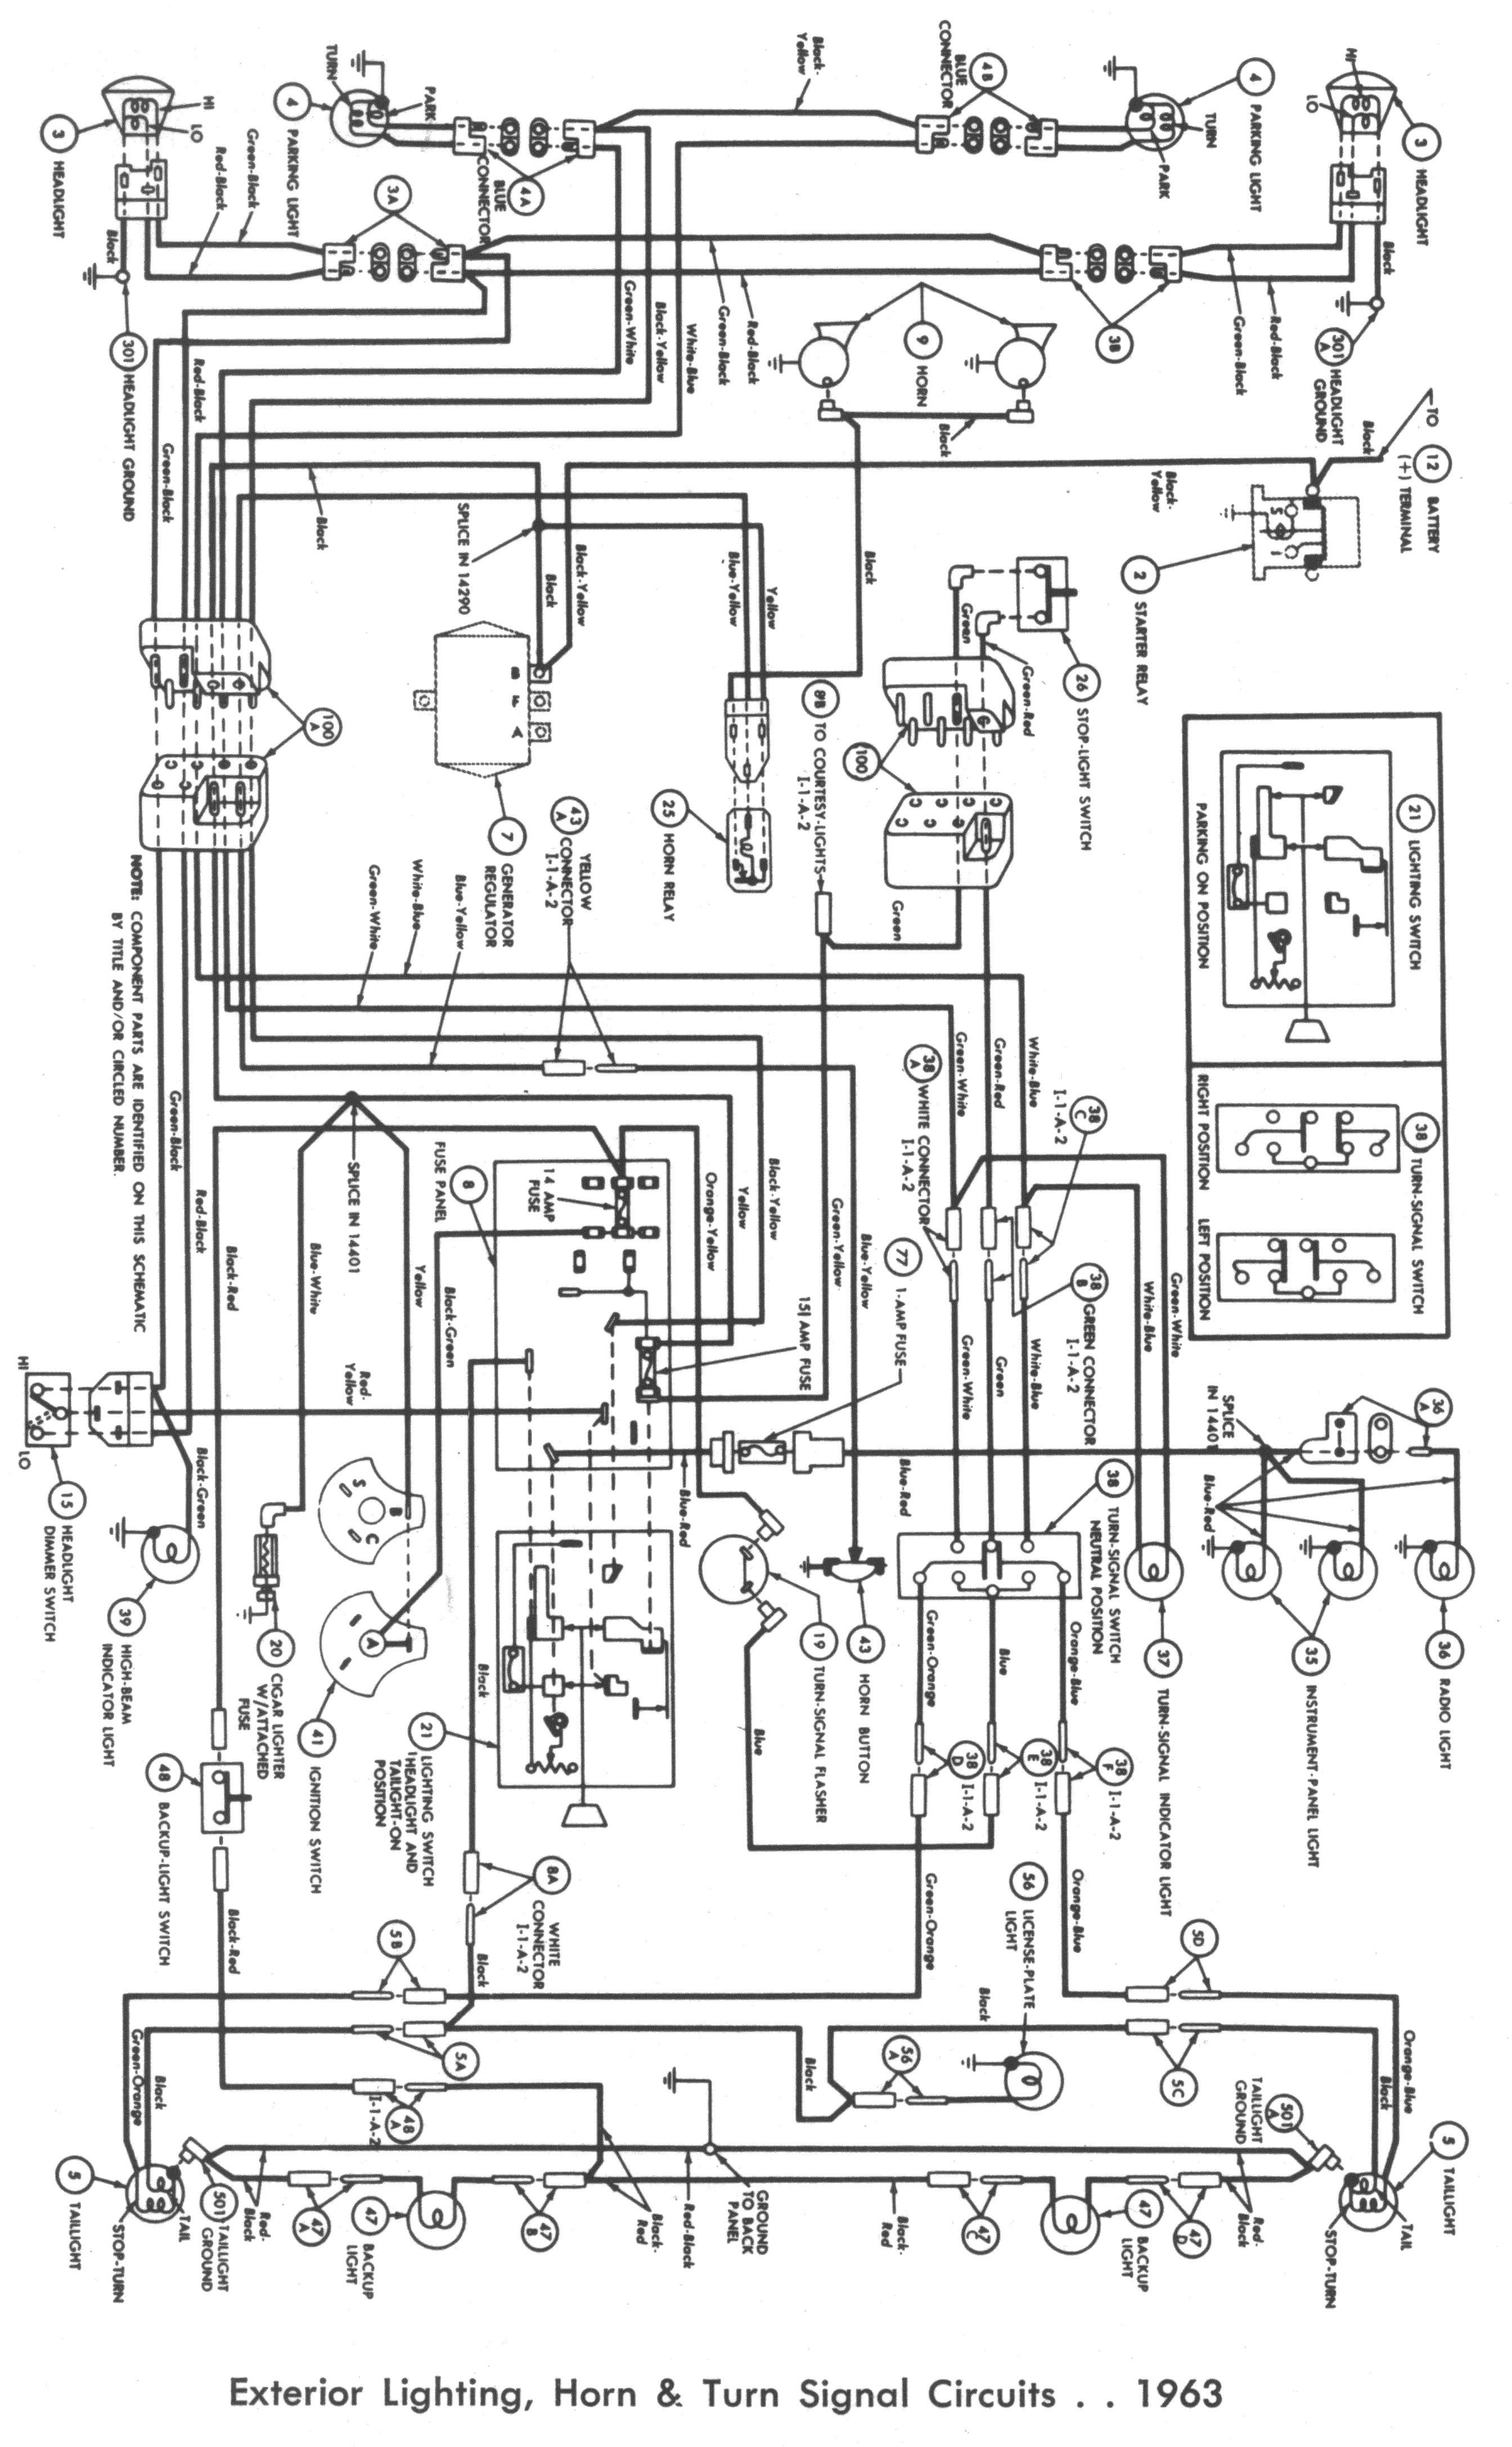 1990 Buick Skylark Fuse Box Diagram. Buick. Auto Wiring